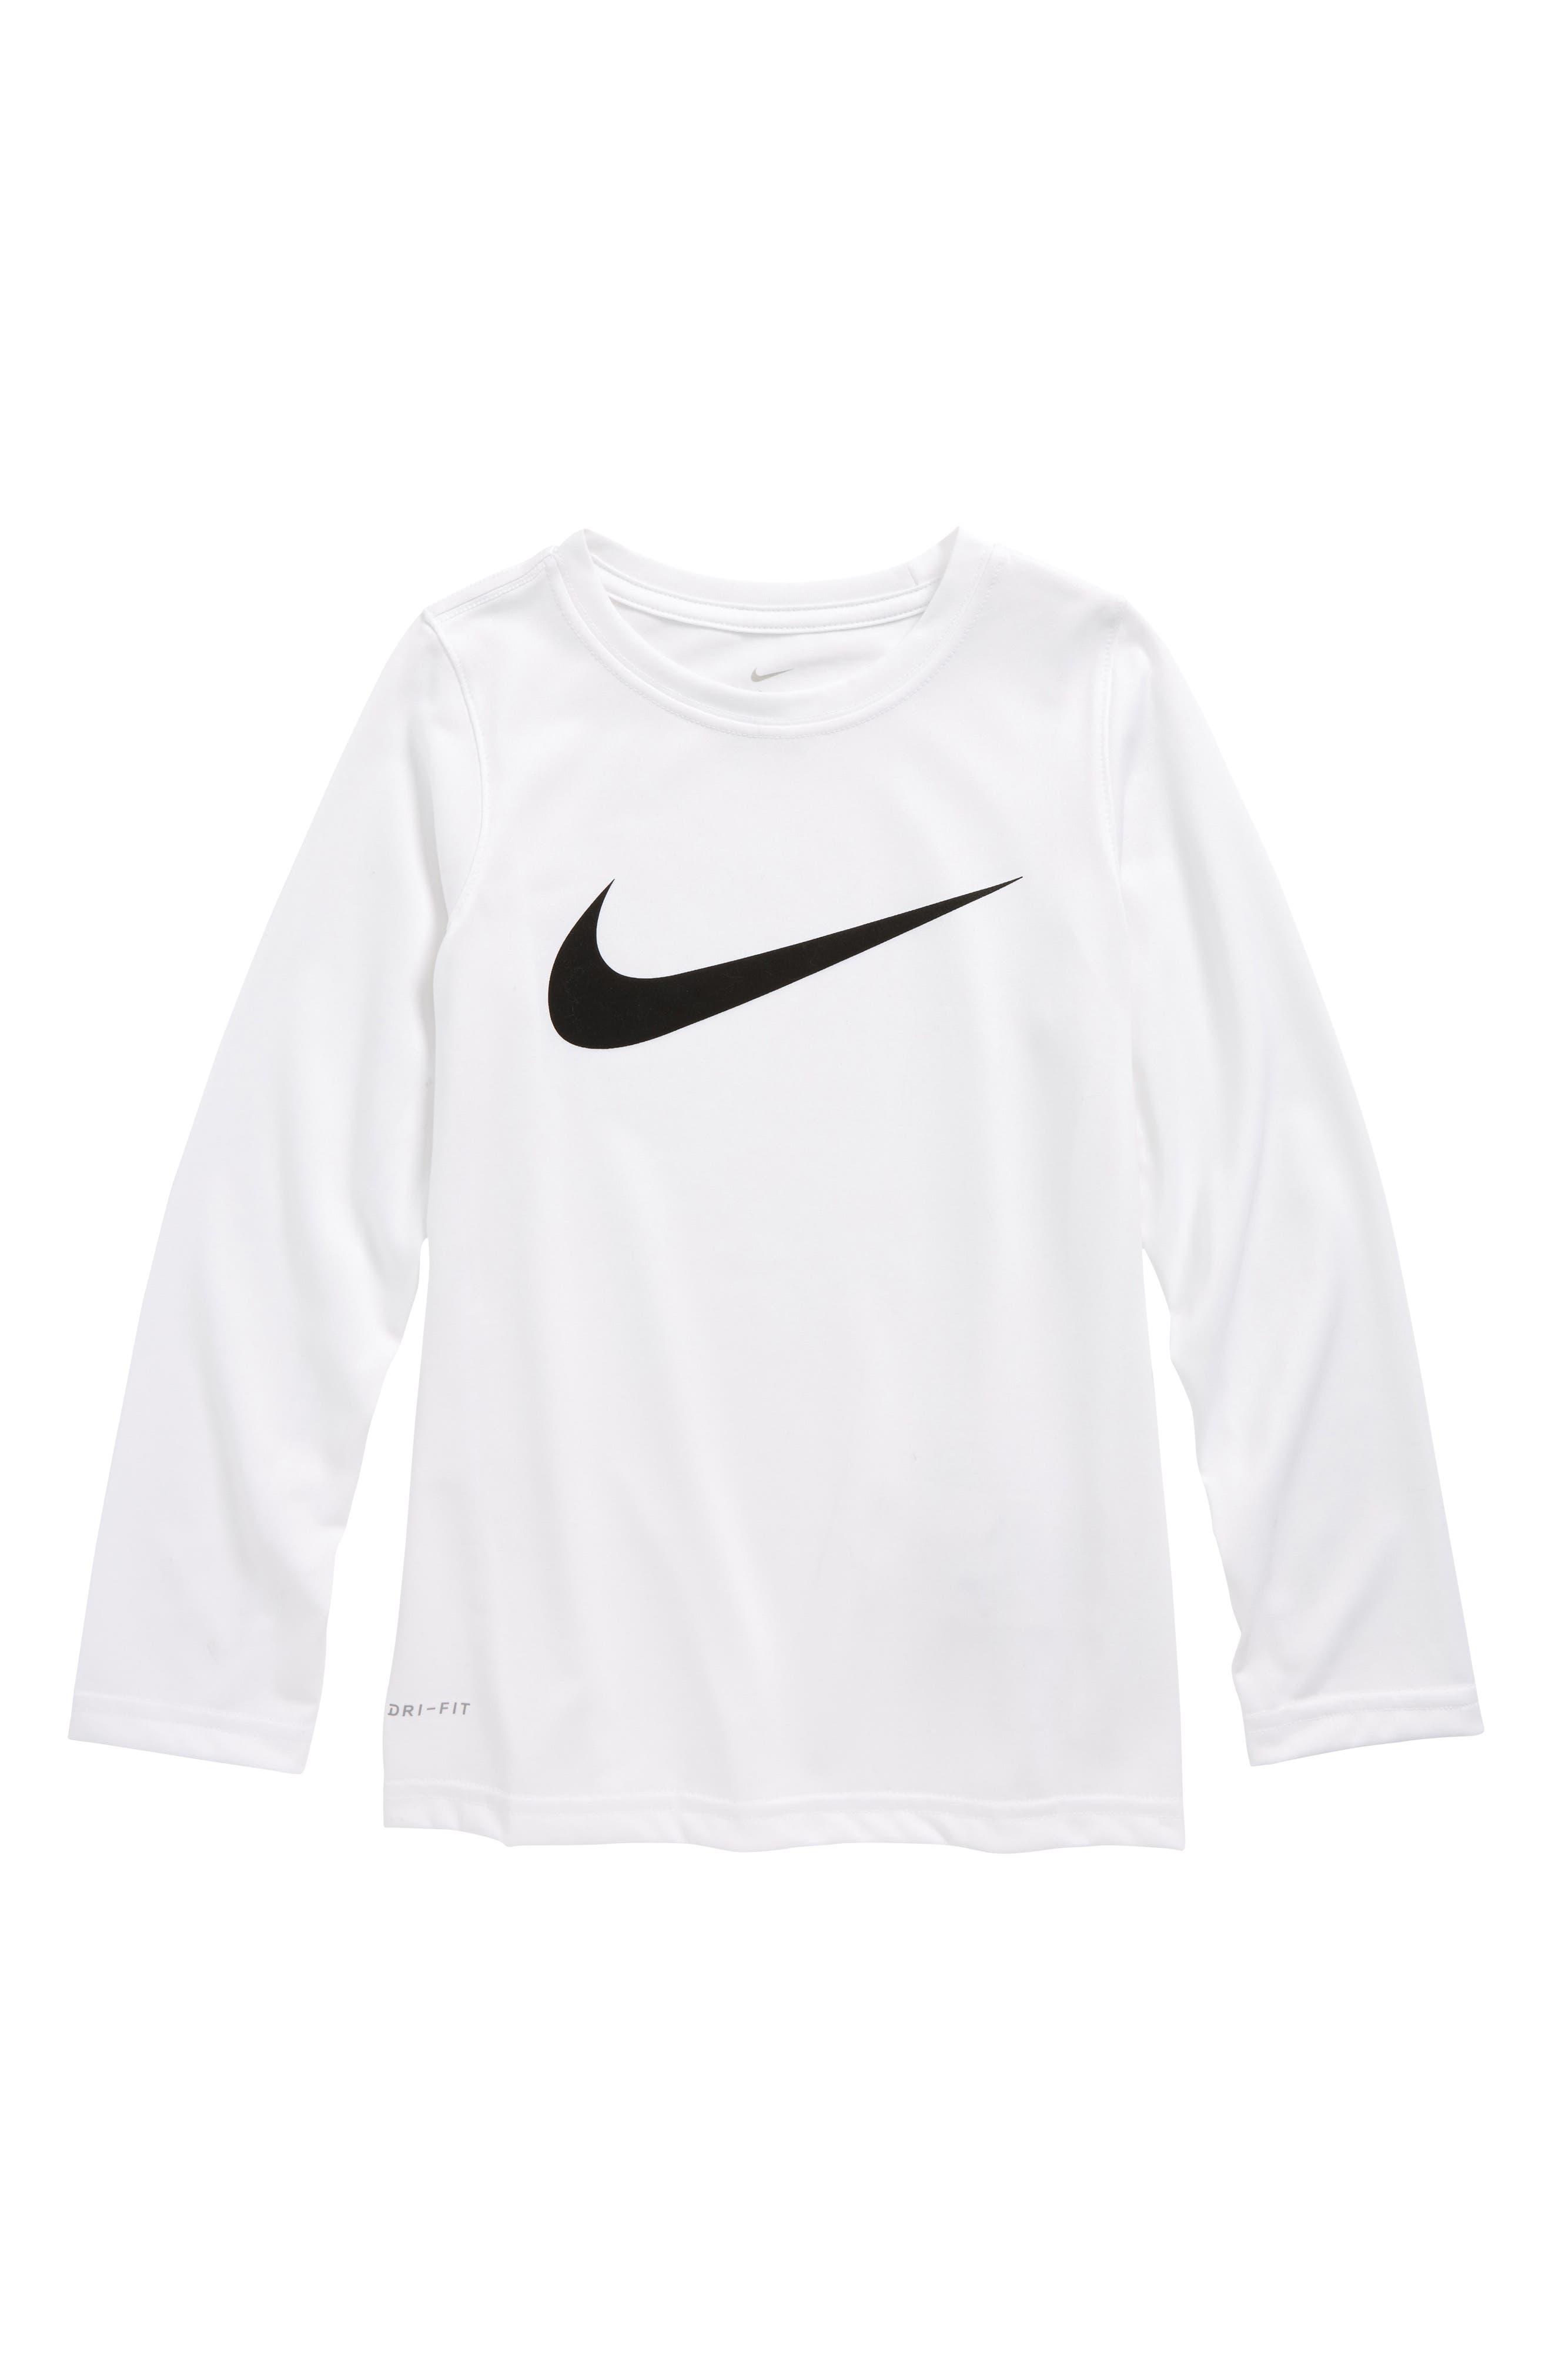 Main Image - Nike Dry Long Sleeve Swoosh Logo T-Shirt (Little Boys & Big Boys)